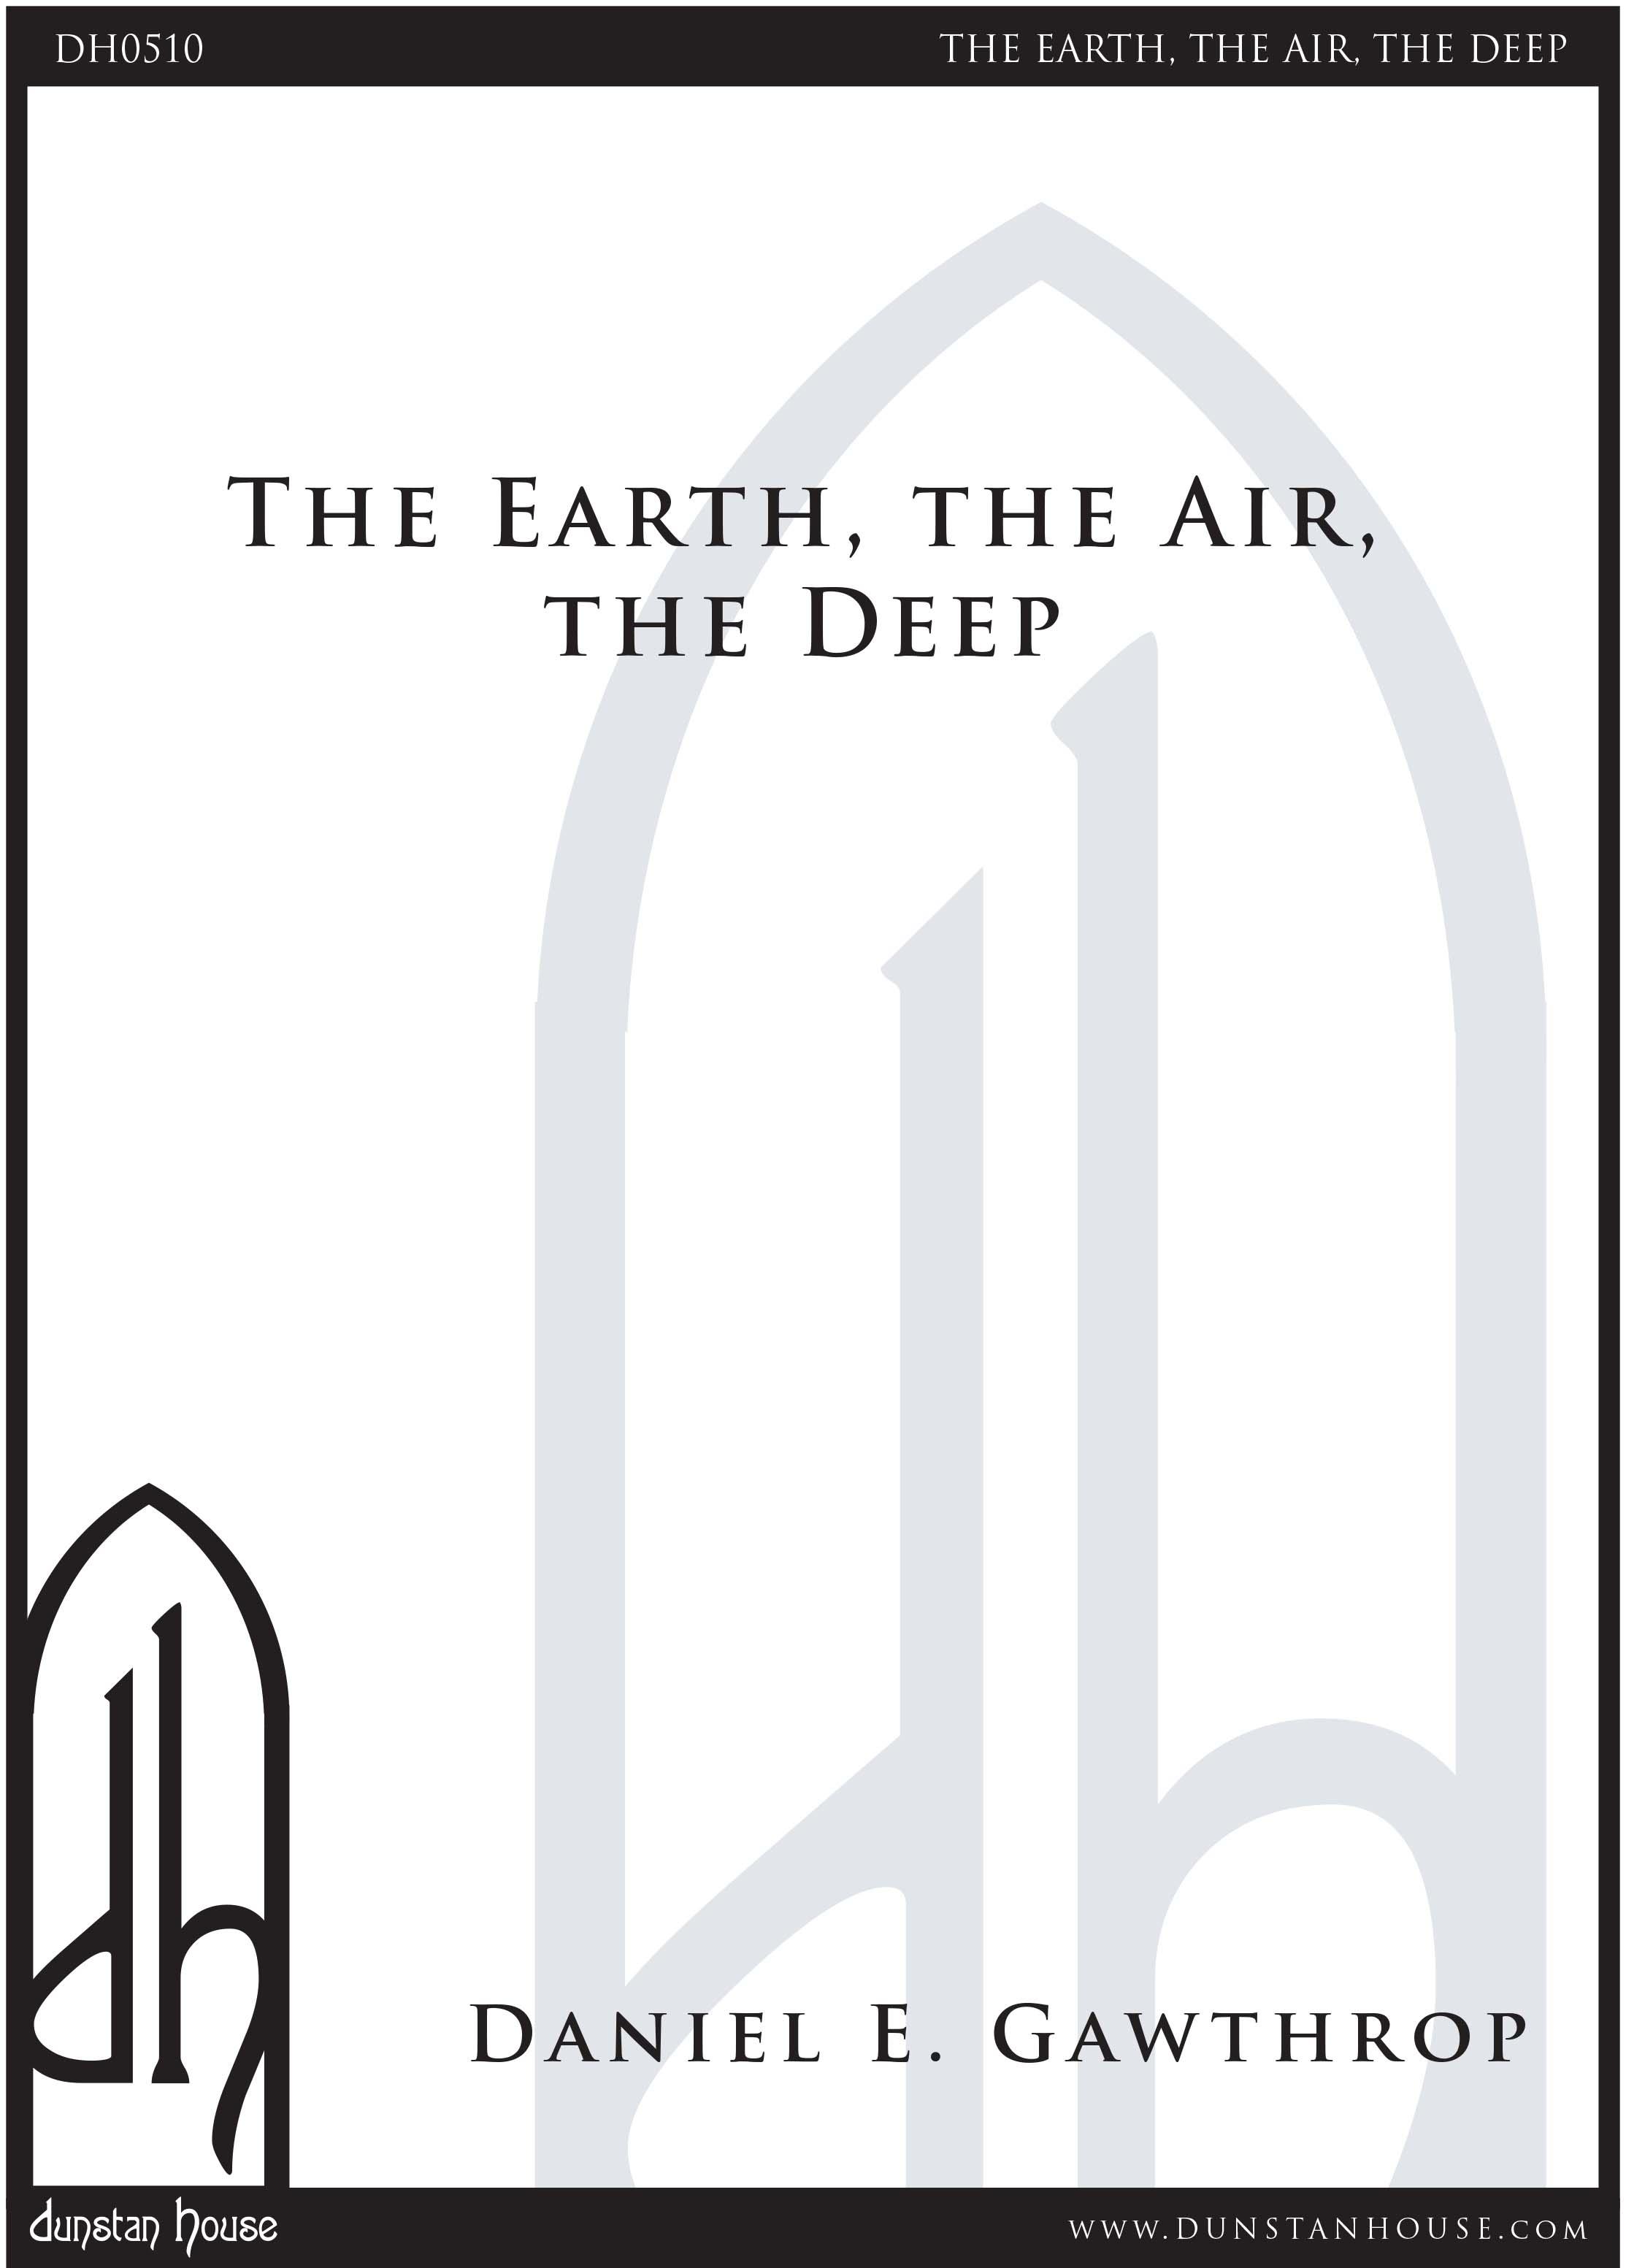 Earth, the Air, the Deep, The